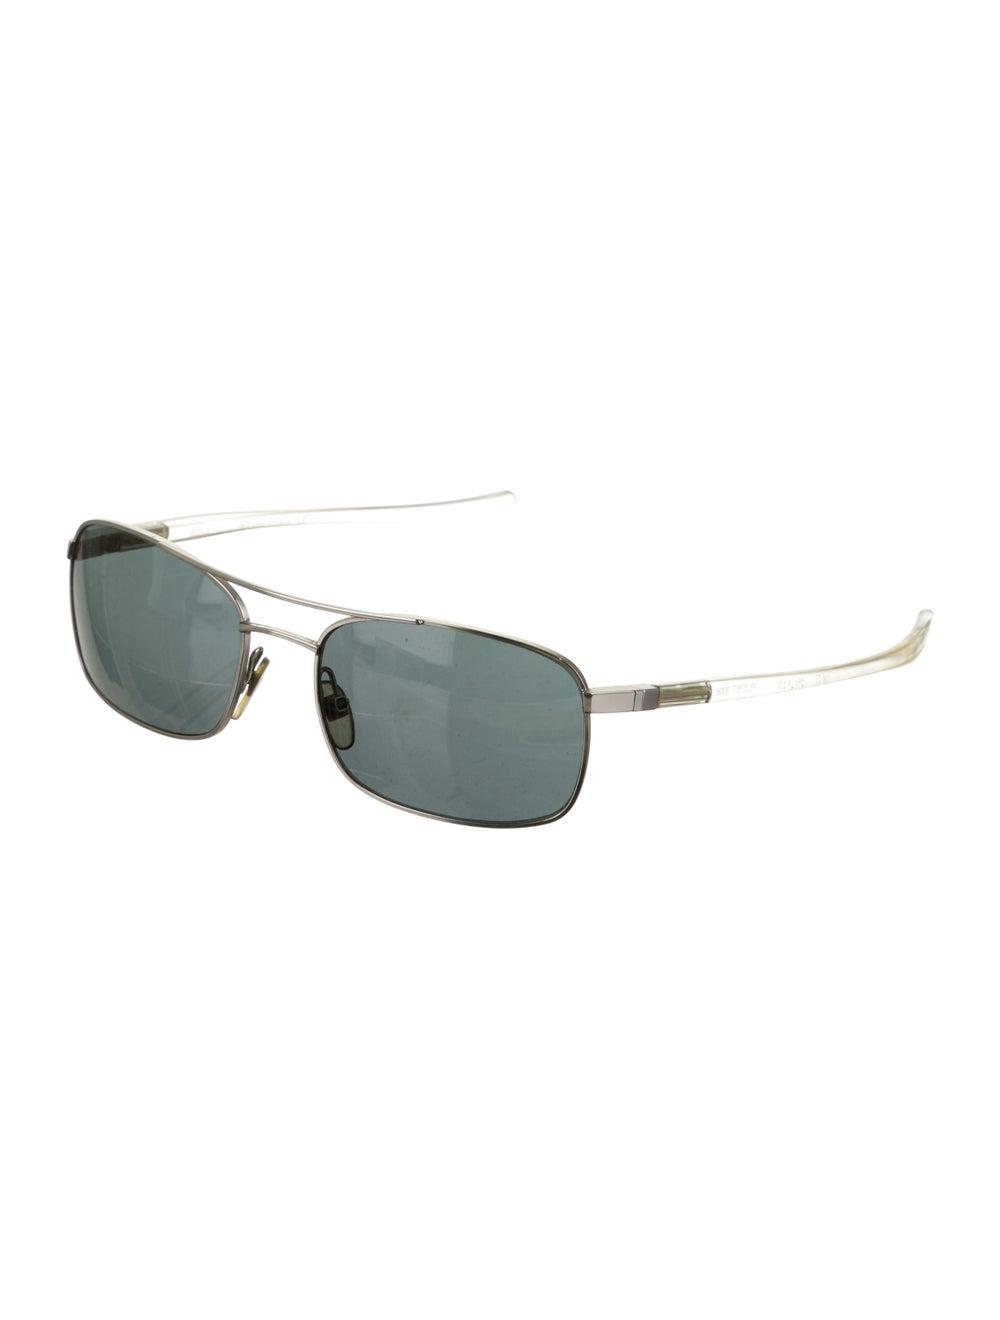 Alain Mikli Tinted Aviator Sunglasses silver - image 2